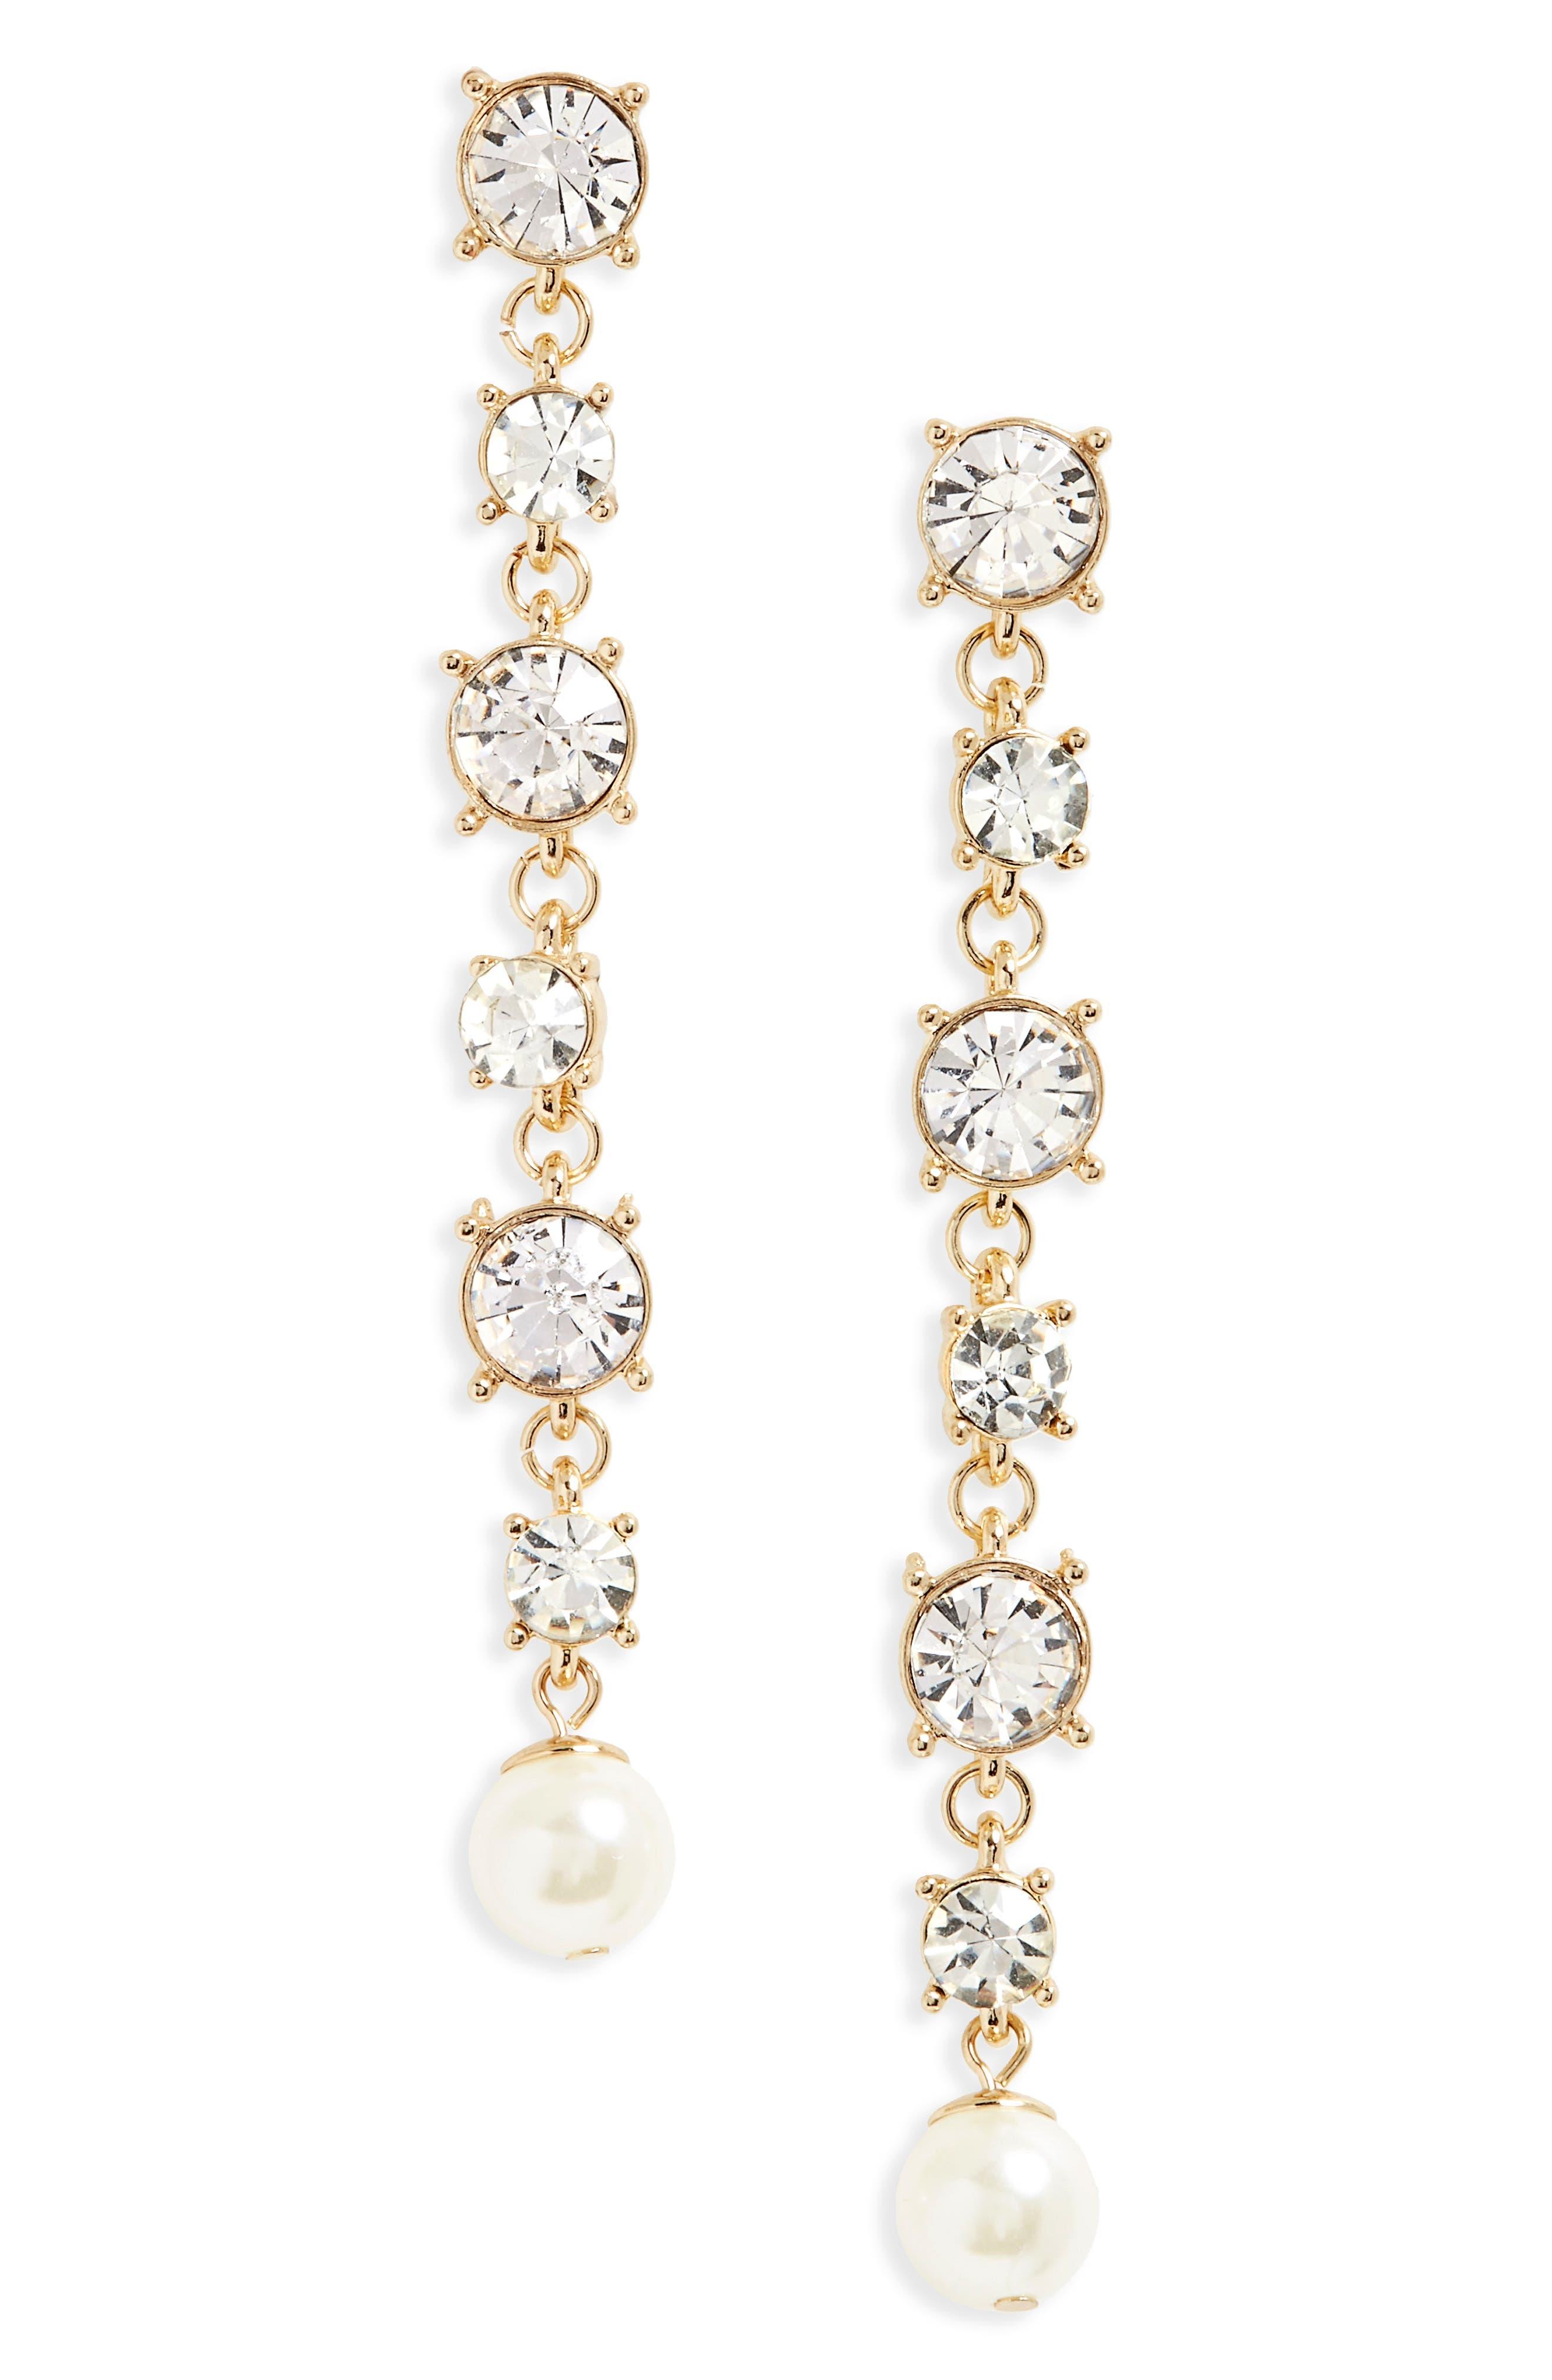 Crystal & Imitation Pearl Drop Earrings,                             Main thumbnail 1, color,                             710